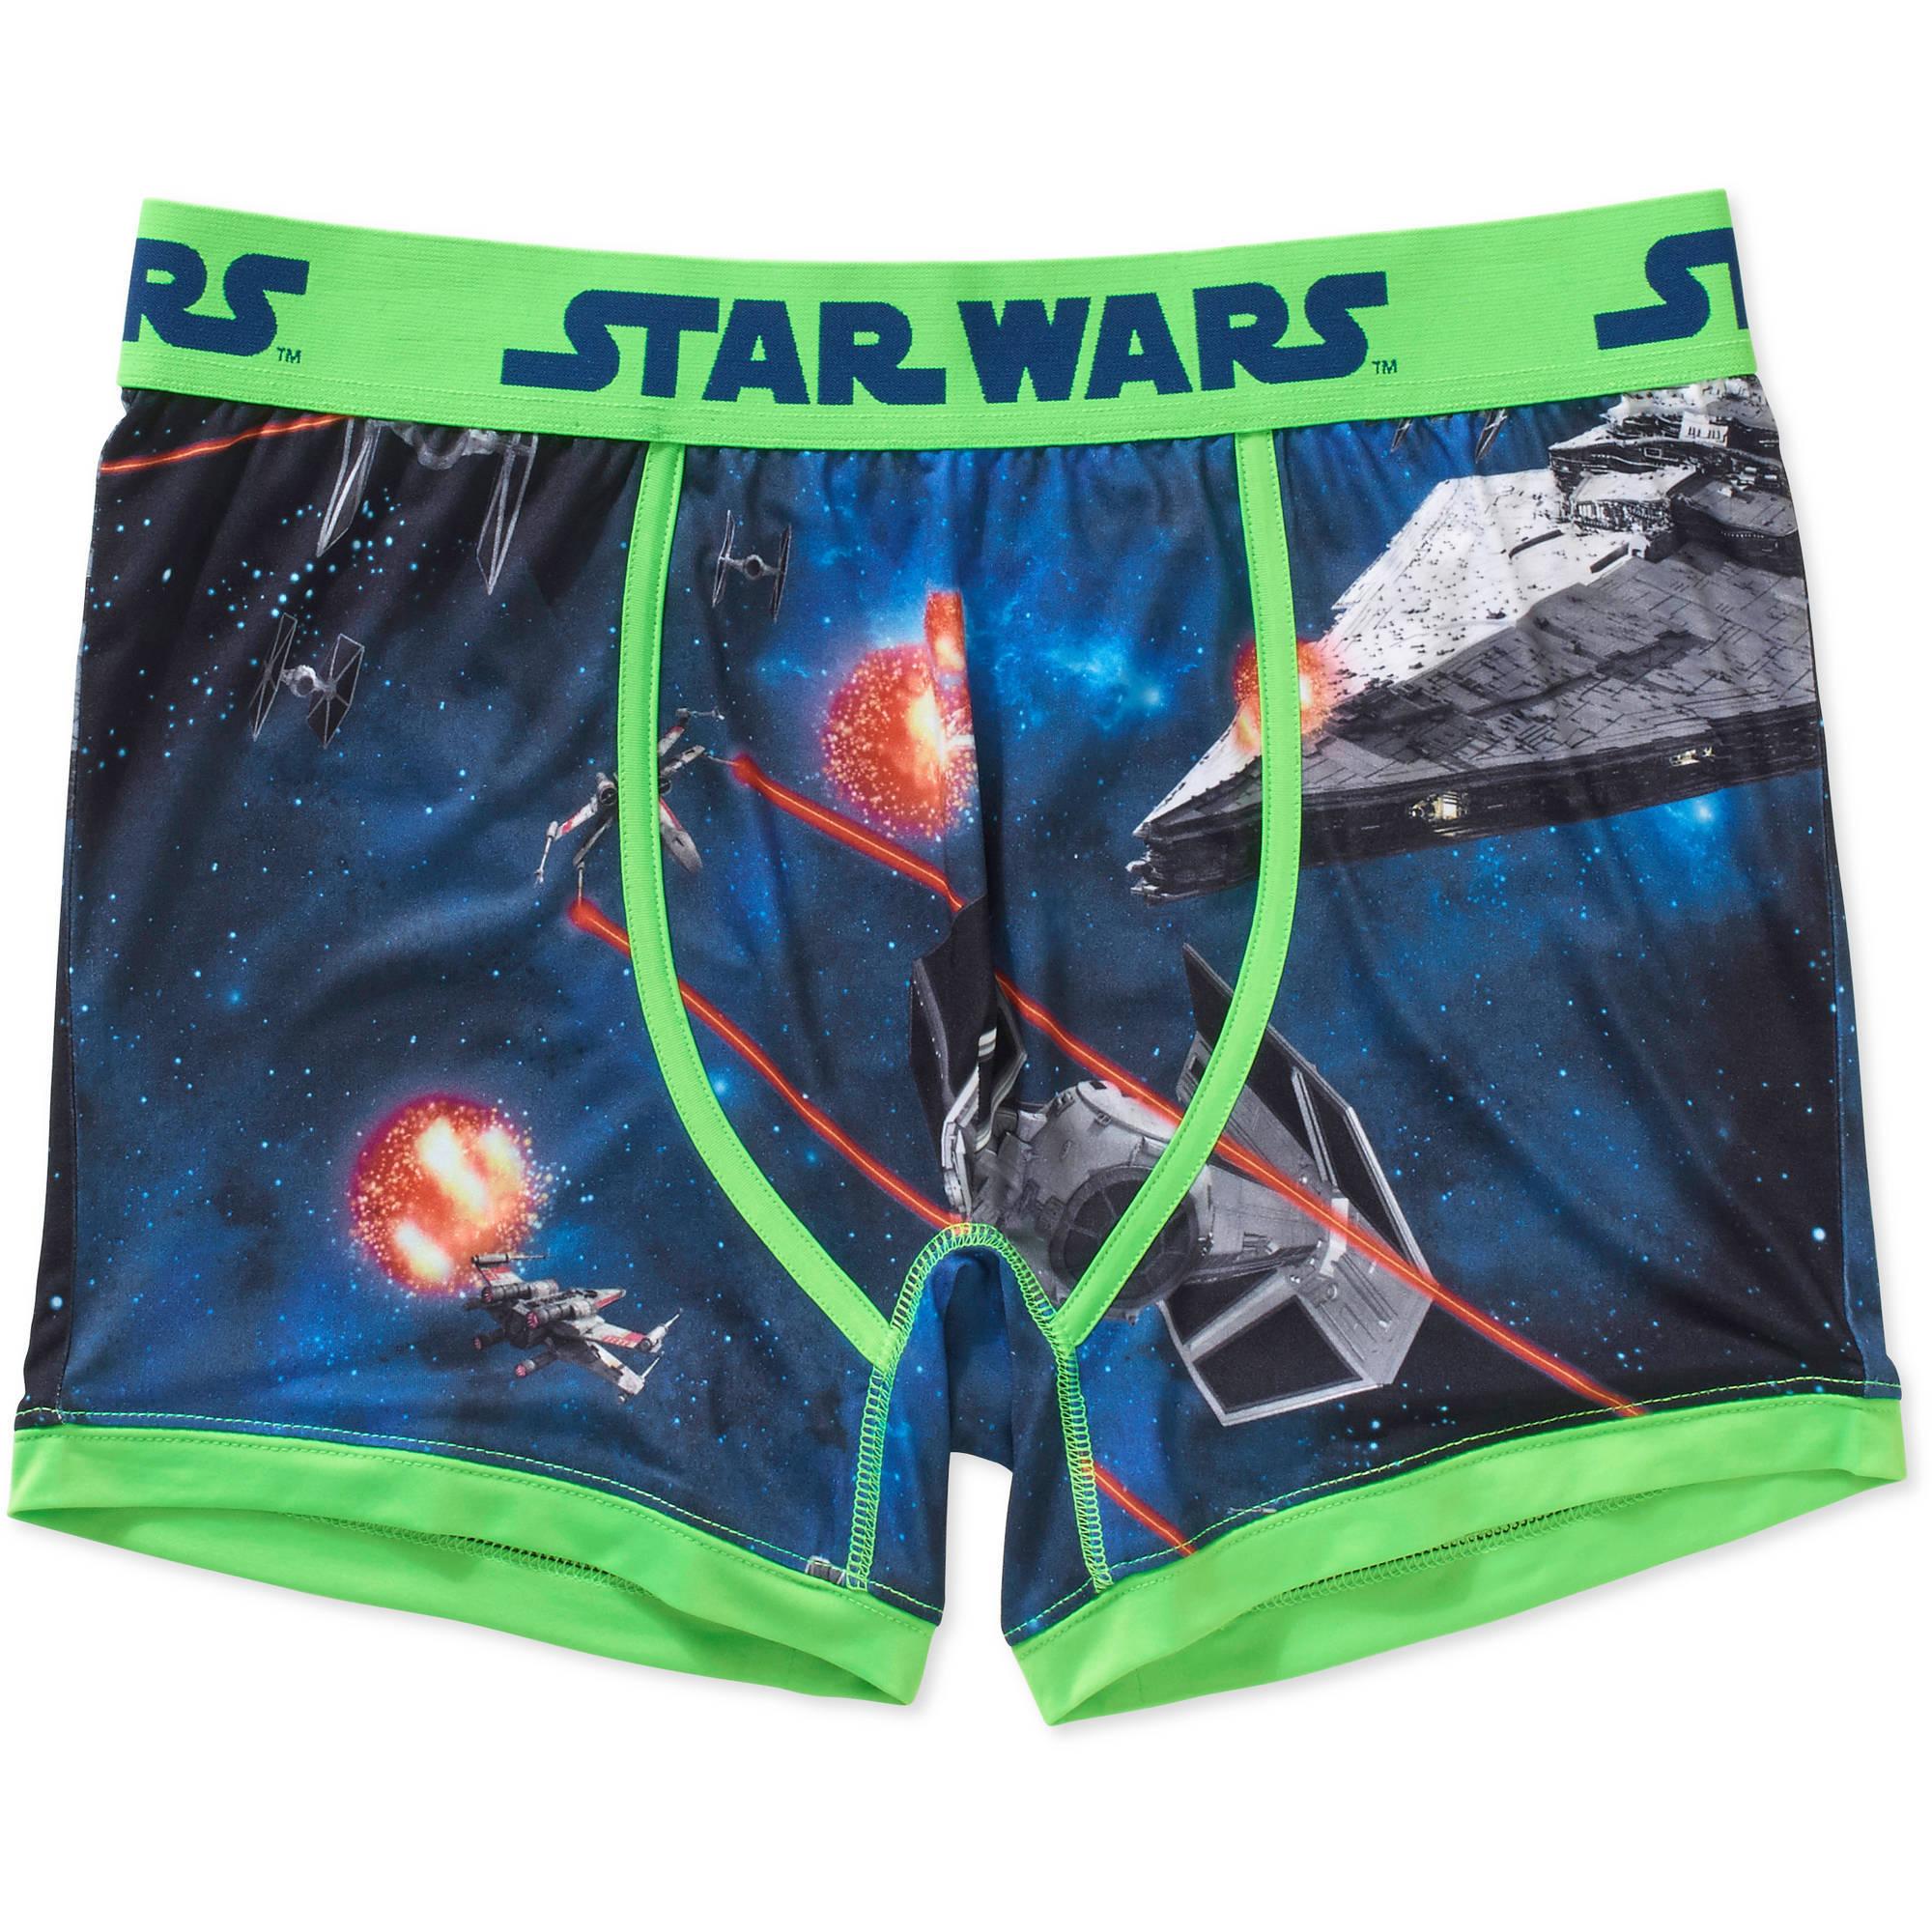 Star Wars Ships Men's Boxer Briefs